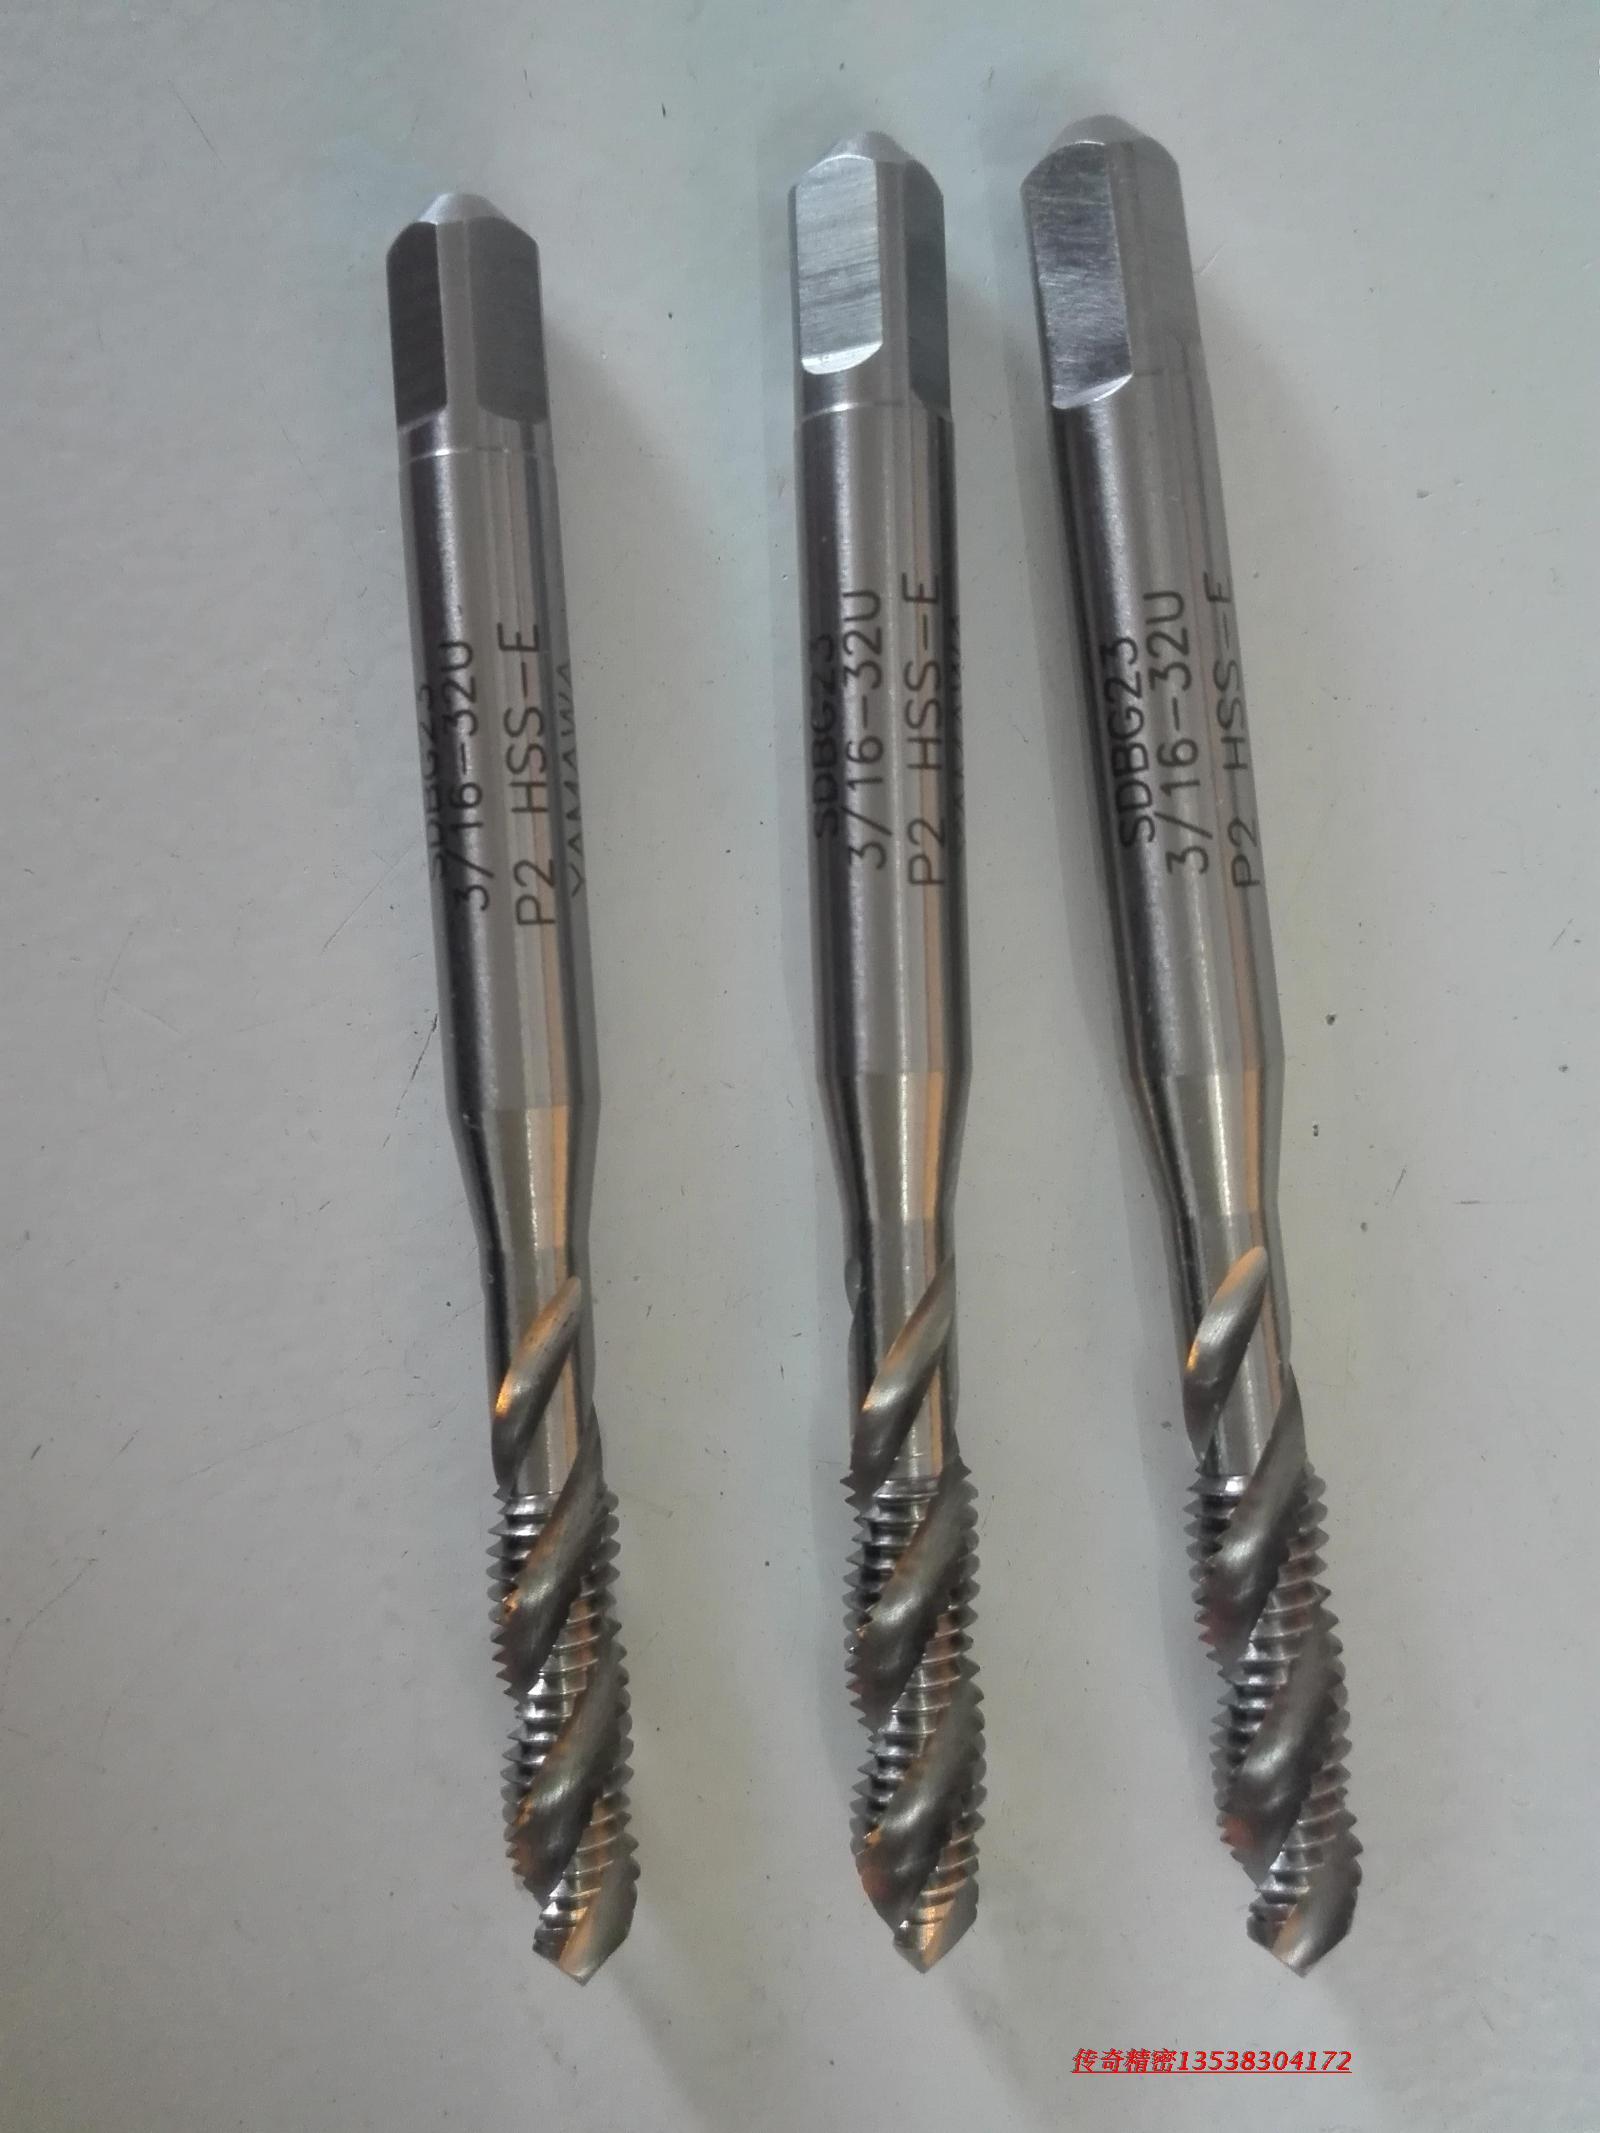 Japan's YAMAWA 3/16-243/16-32 UNJFUNJC made spiral tap tap to increase accuracy